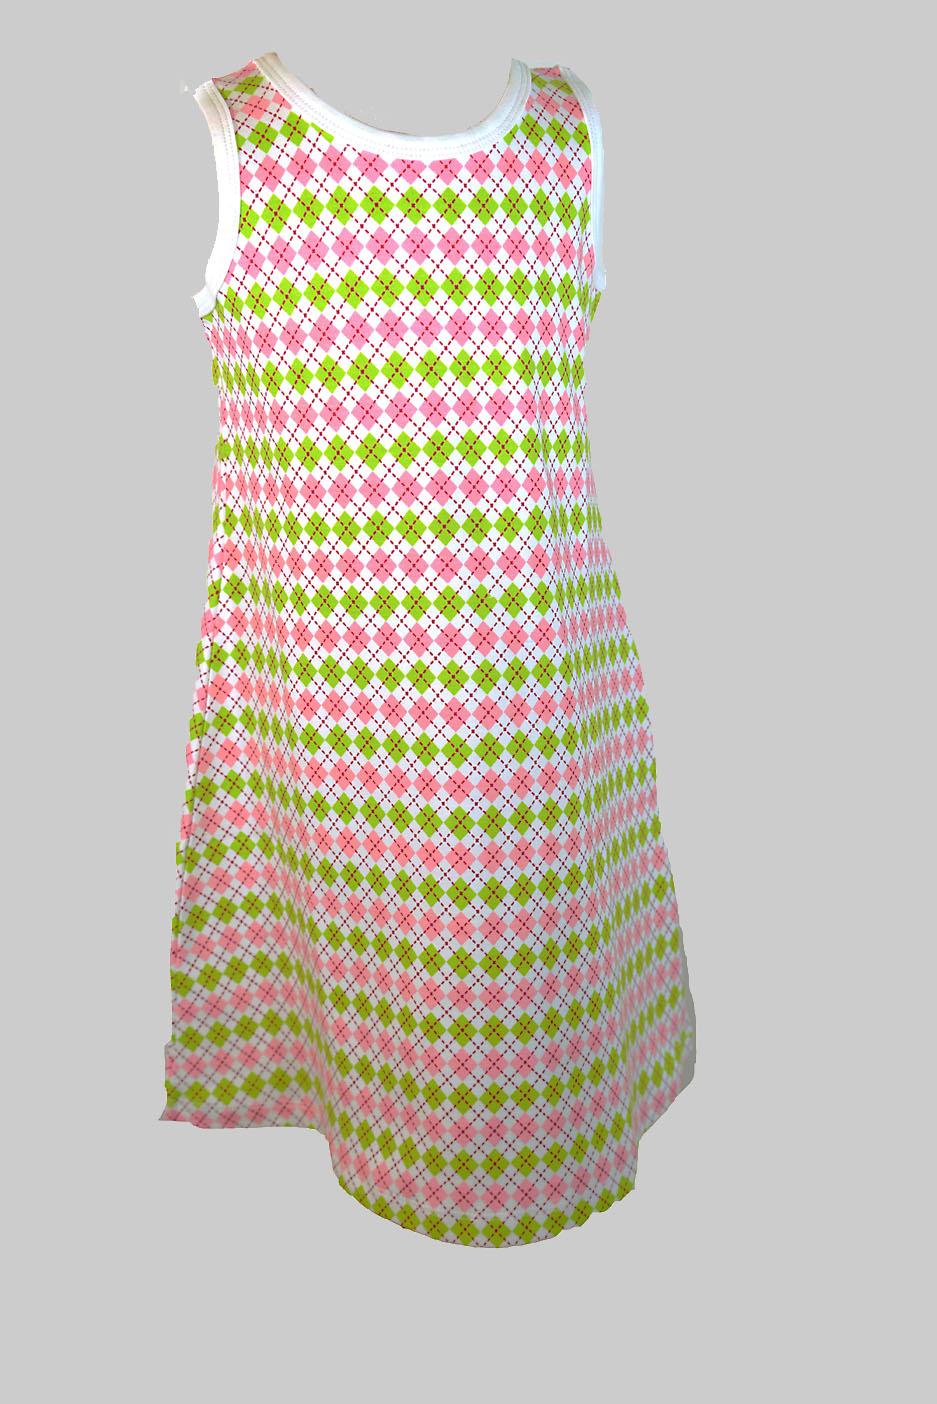 Argyle Toddler Girl Dress